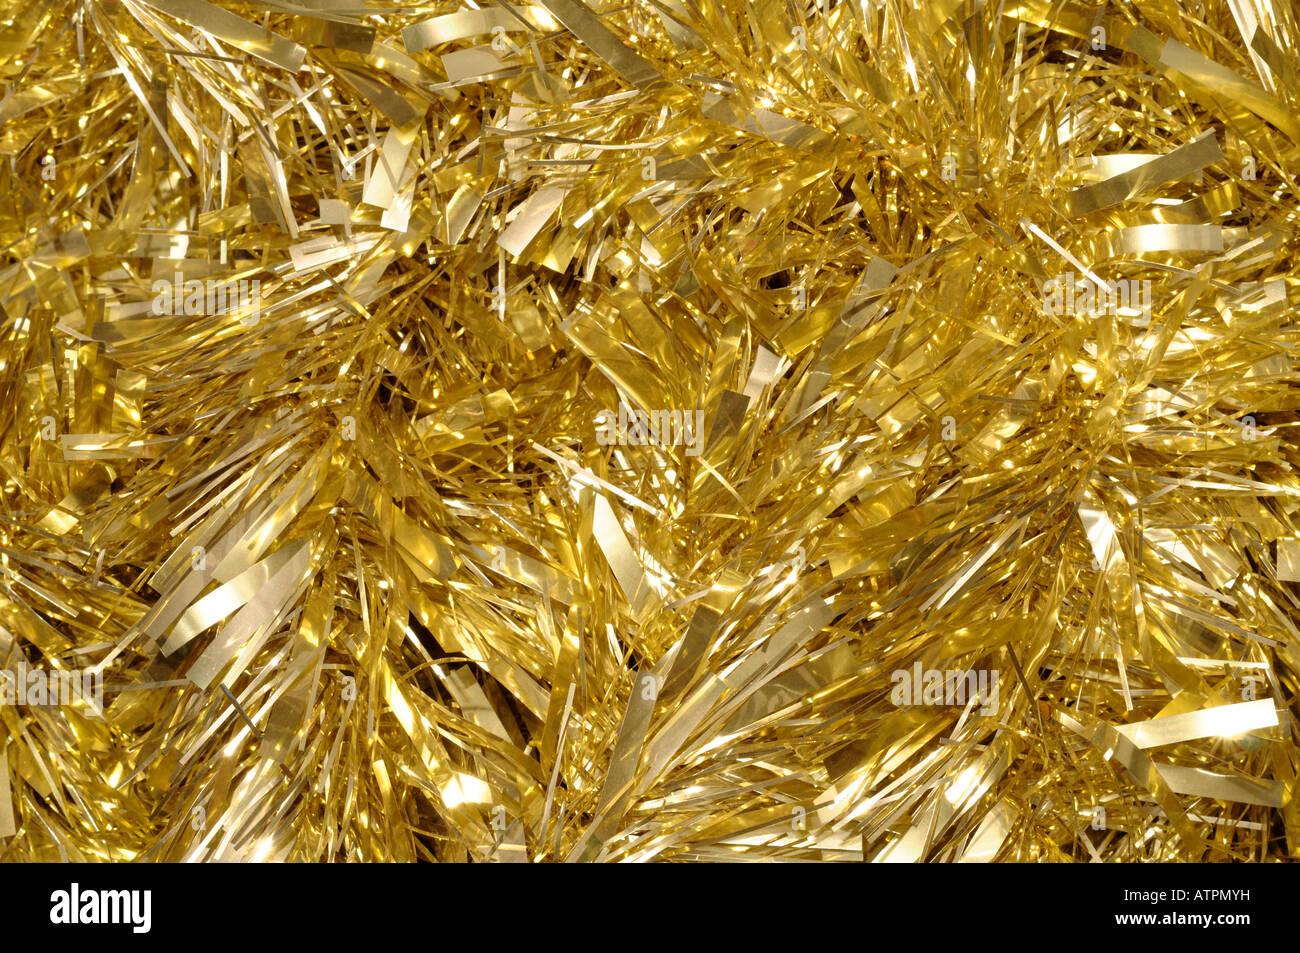 Gold tinsel - Stock Image